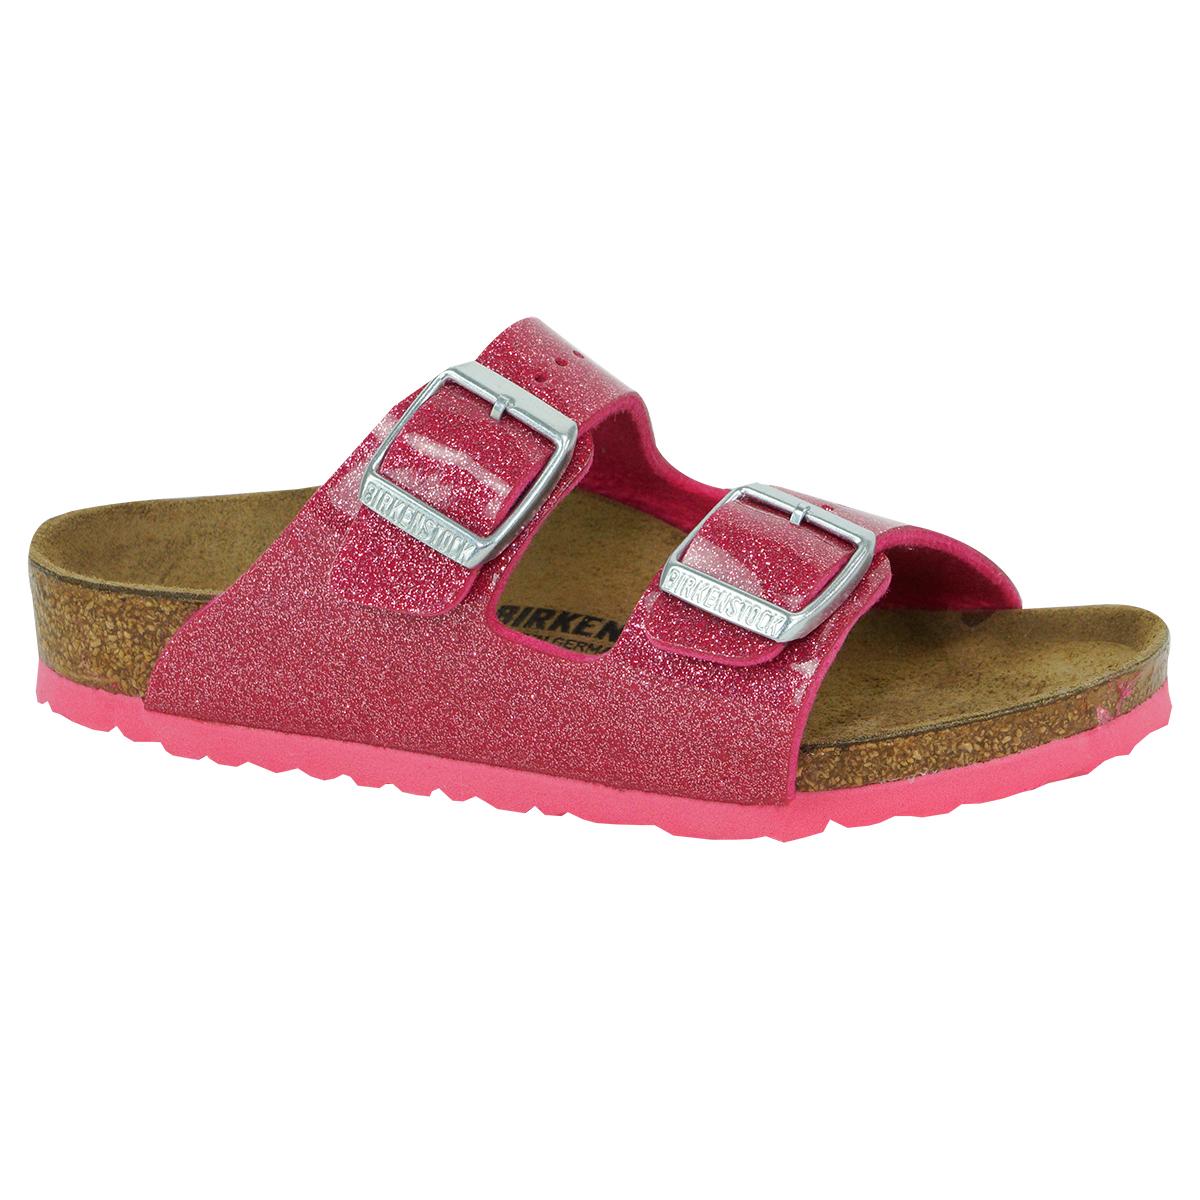 Details about Birkenstock Kids' Arizona Sandals Birko Flor Magic Galaxy Bright Rose 27 N